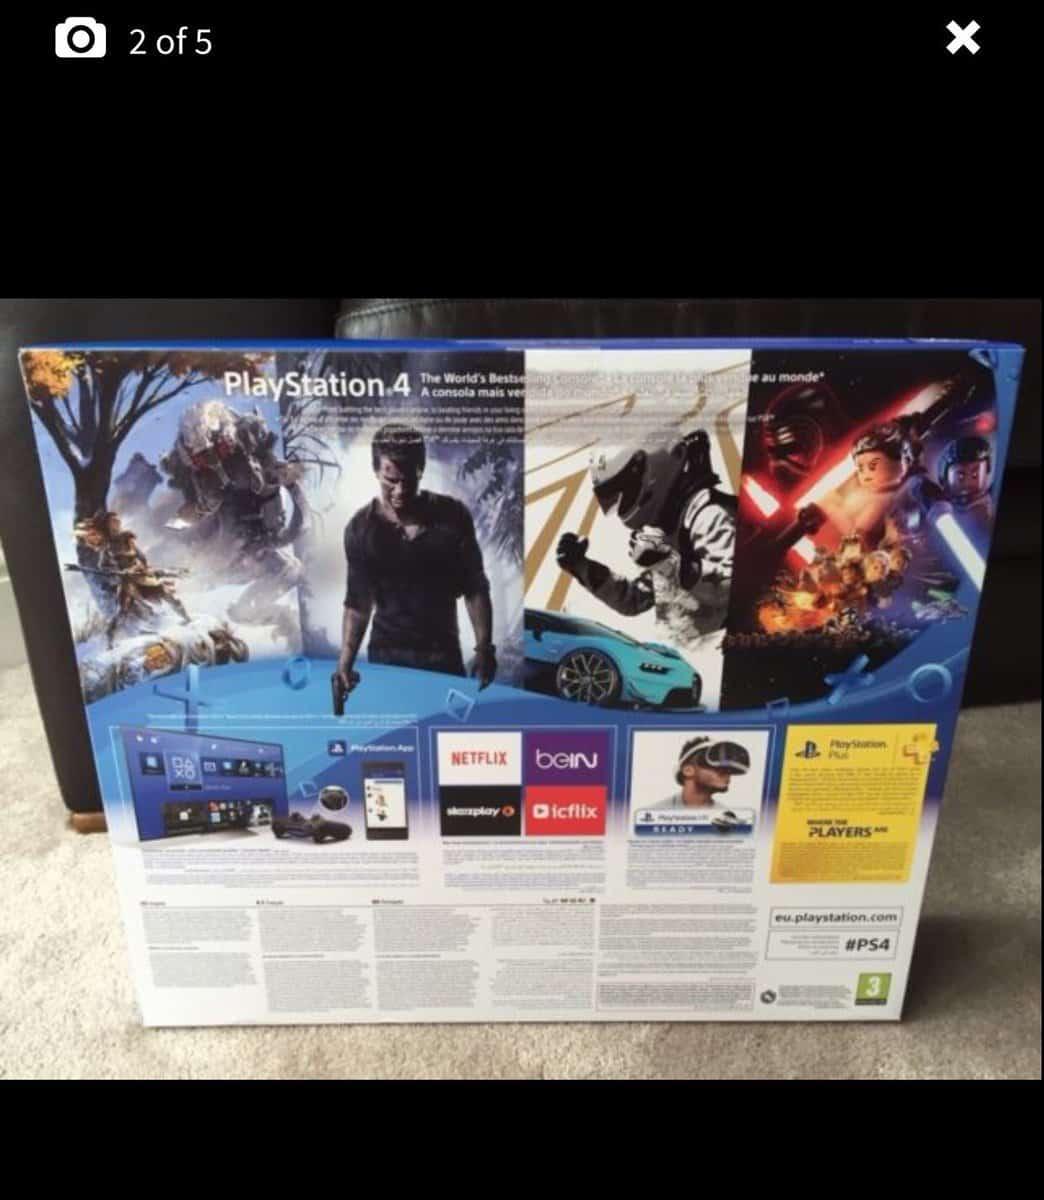 PlayStation 4 Slim caja